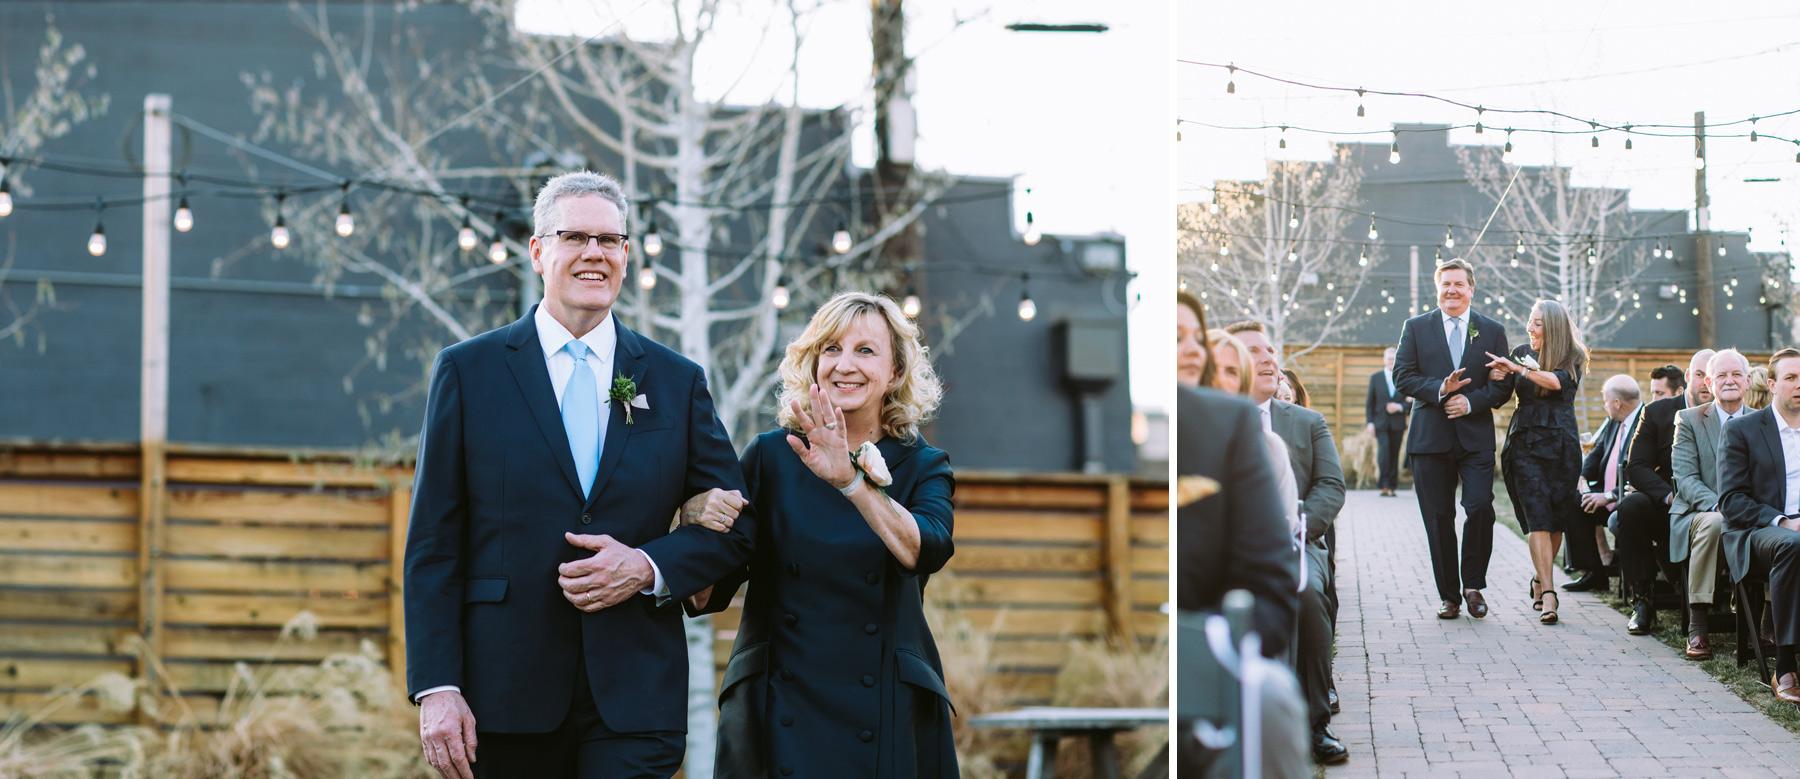 Pete + Susannah The Guild Kansas City Bohemian Outdoor Wedding _Kindling Wedding Photography - 41.JPG